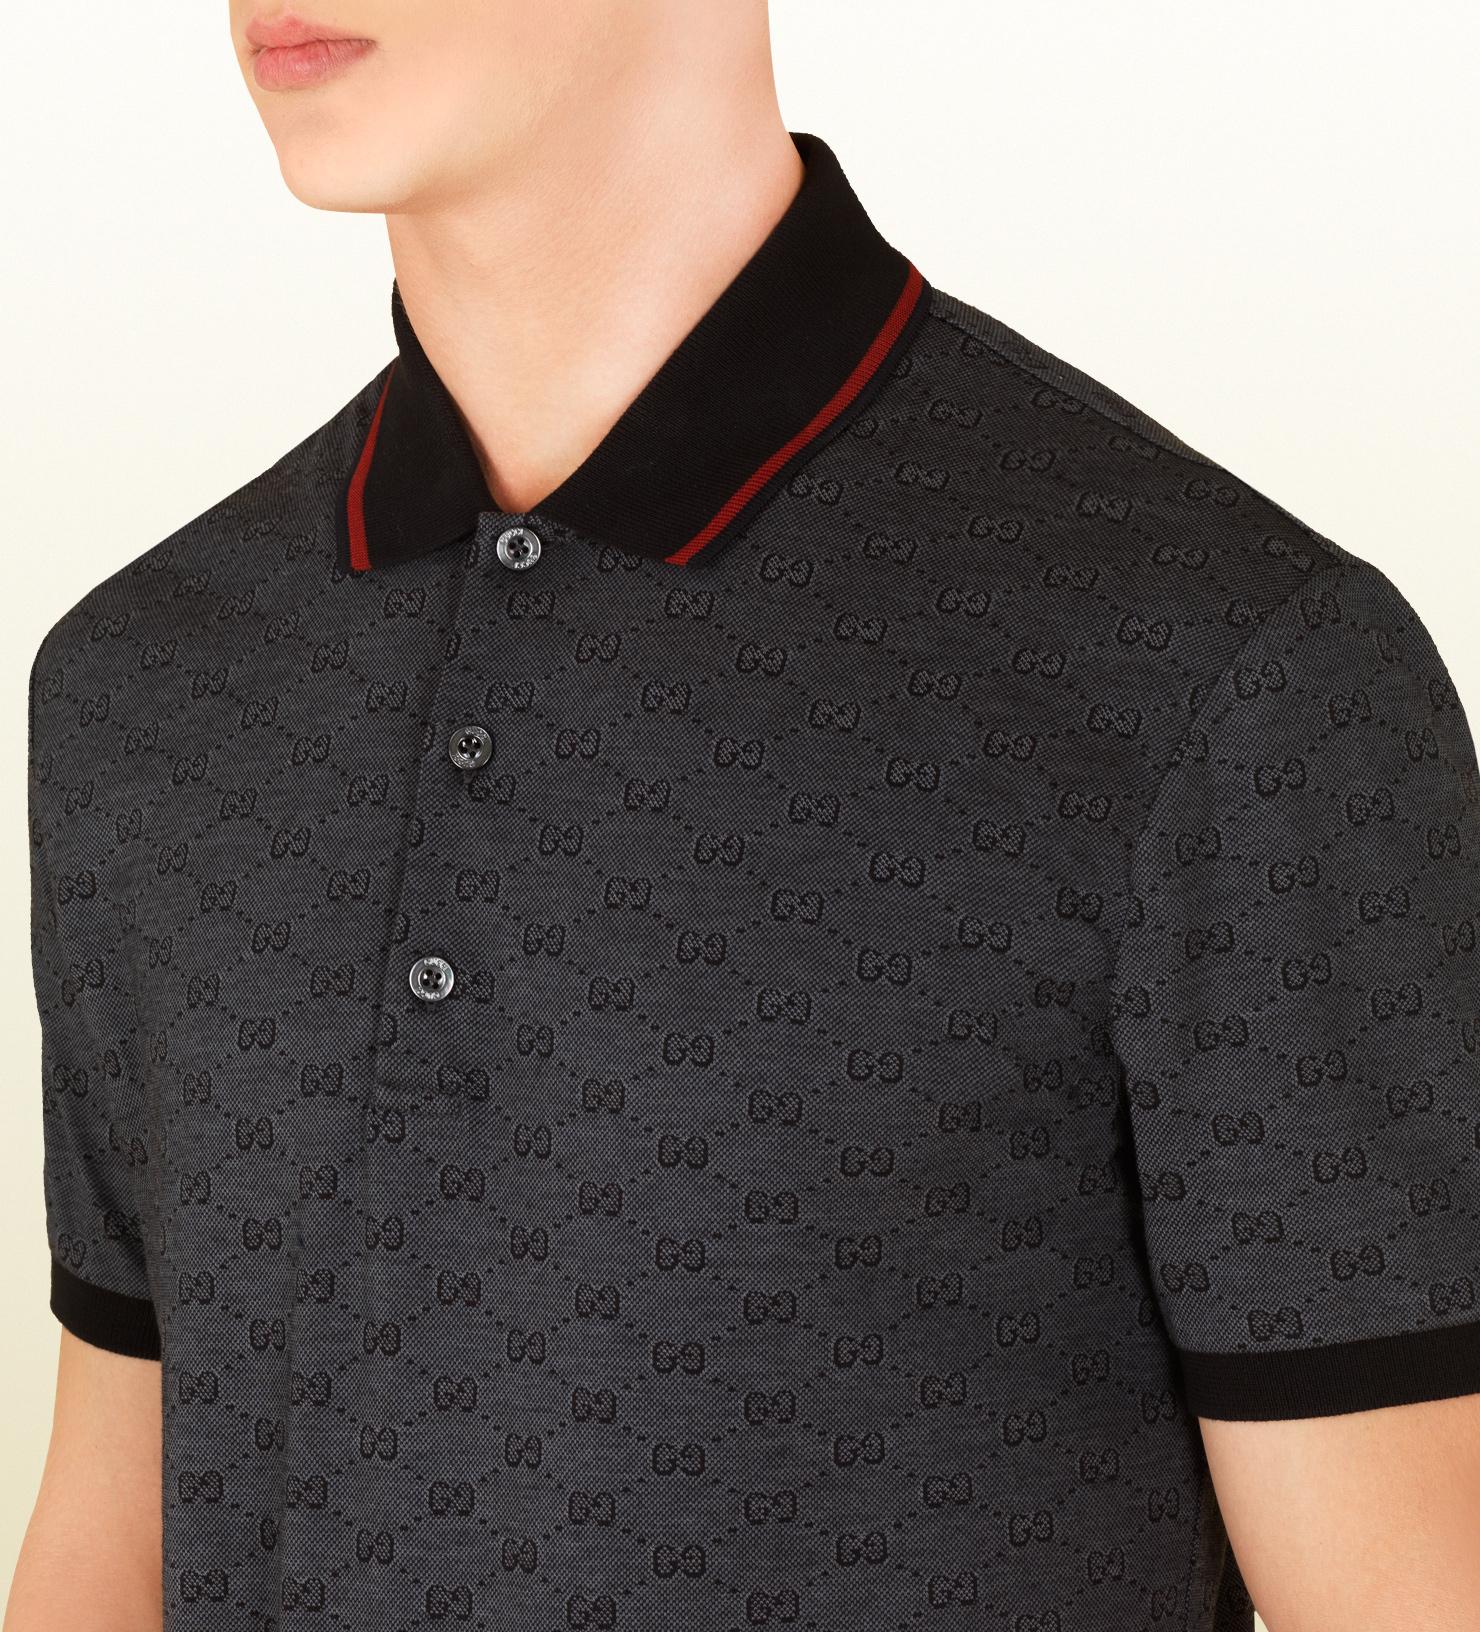 8b6b584311c2 Gucci Dark Grey Pique Gg Jacquard Short Sleeve Polo in Gray for Men ...